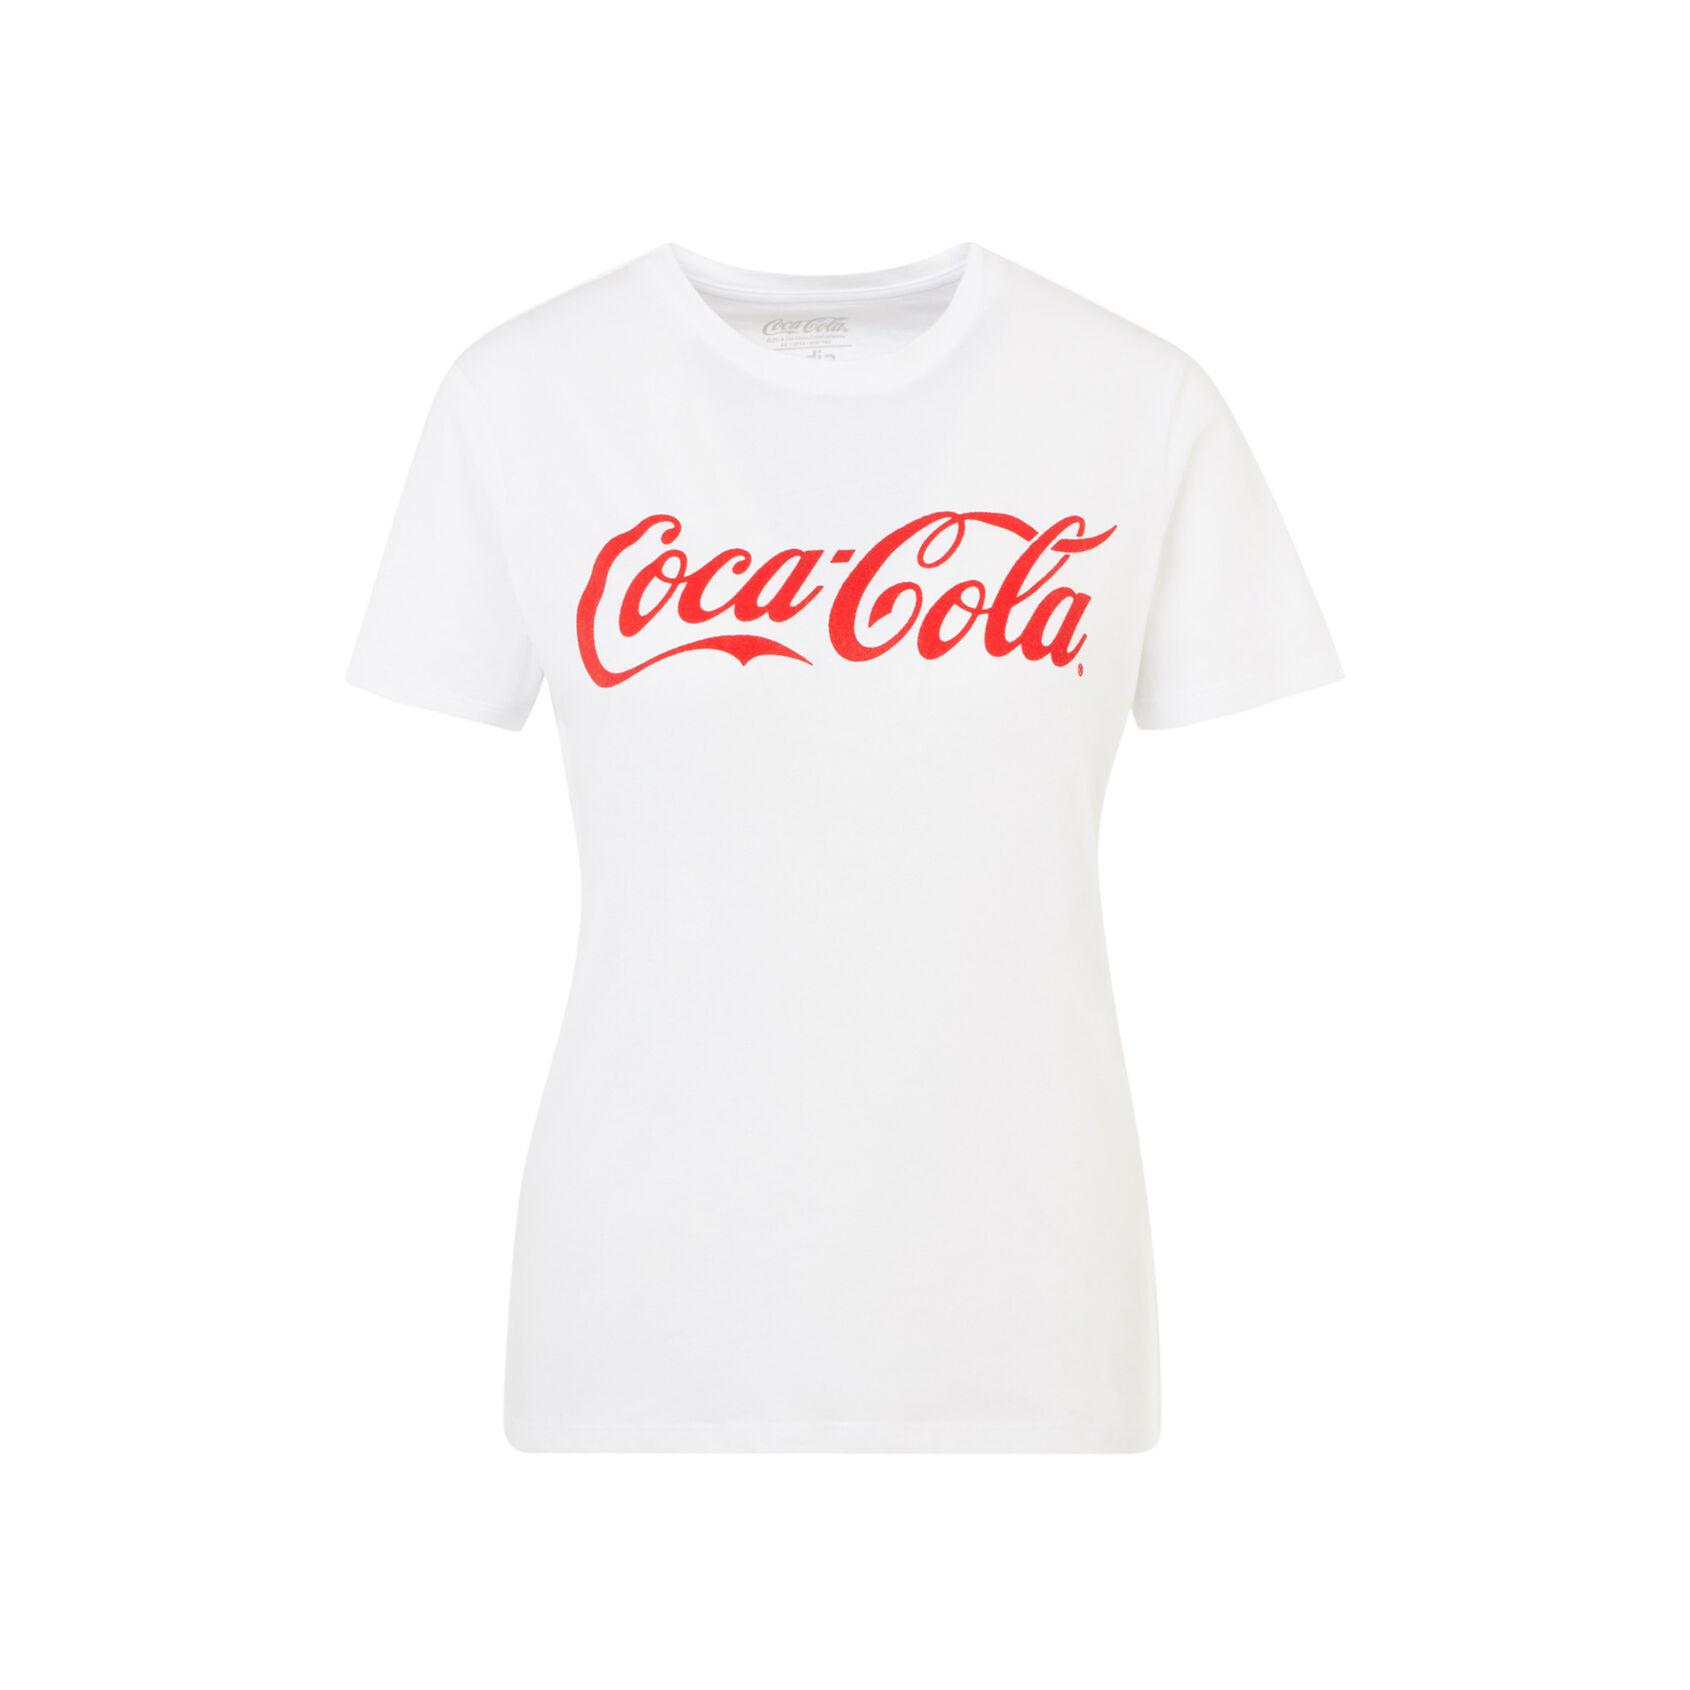 c8de2861a14 Top blanc cocacoliz - Undiz